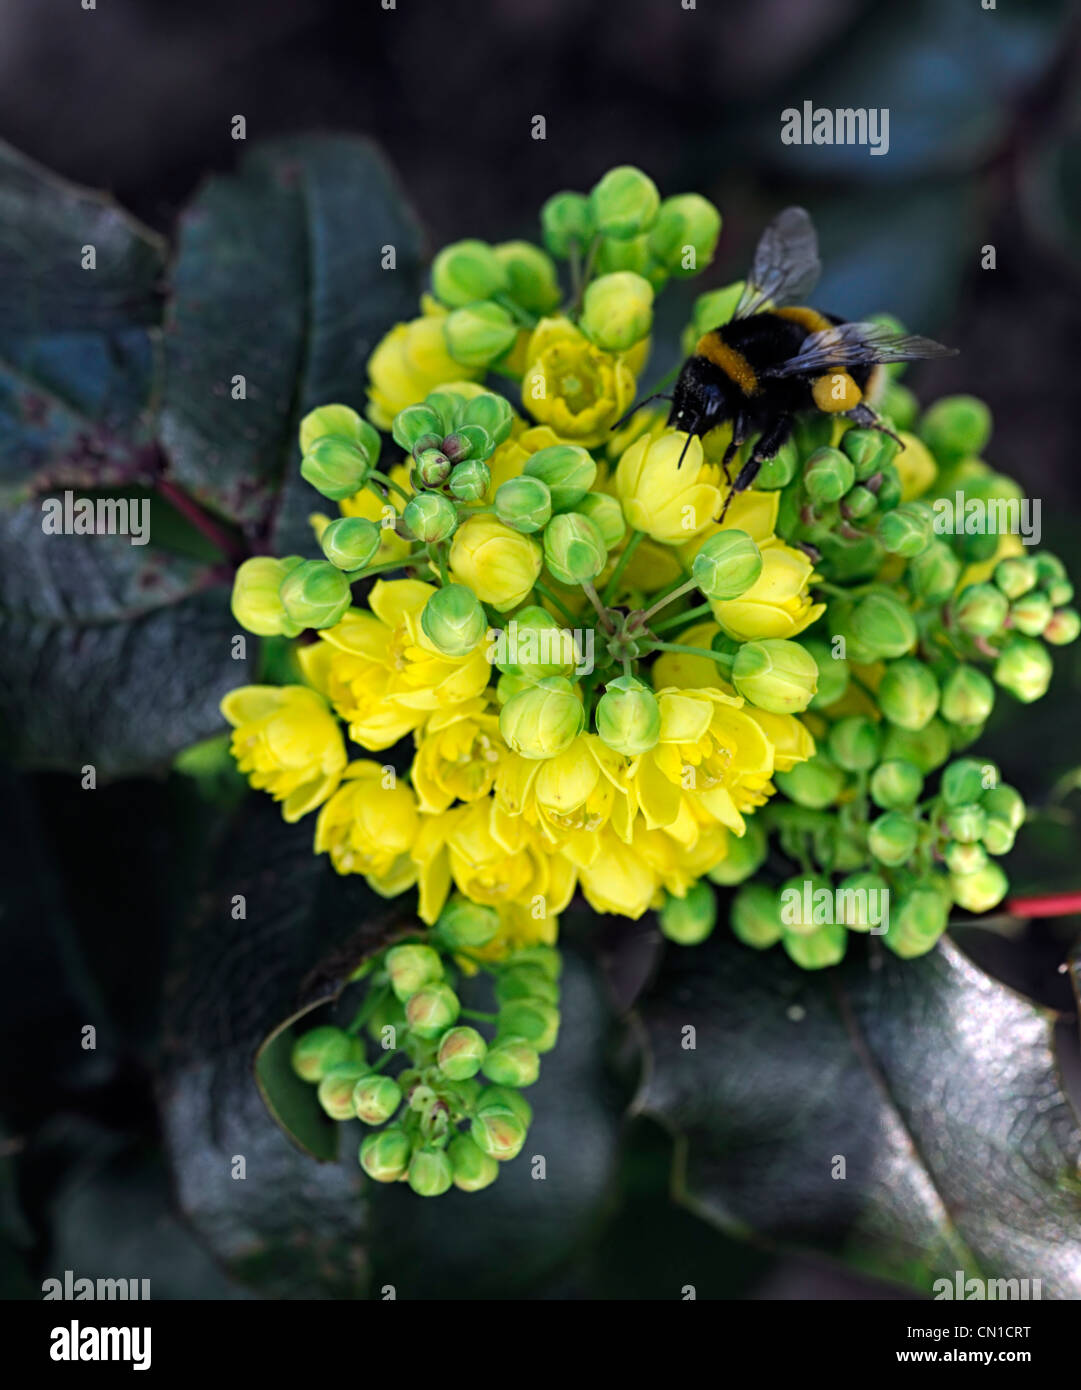 Mahonia Repens Printemps Fleurs Jaune Alimentation Alimentation